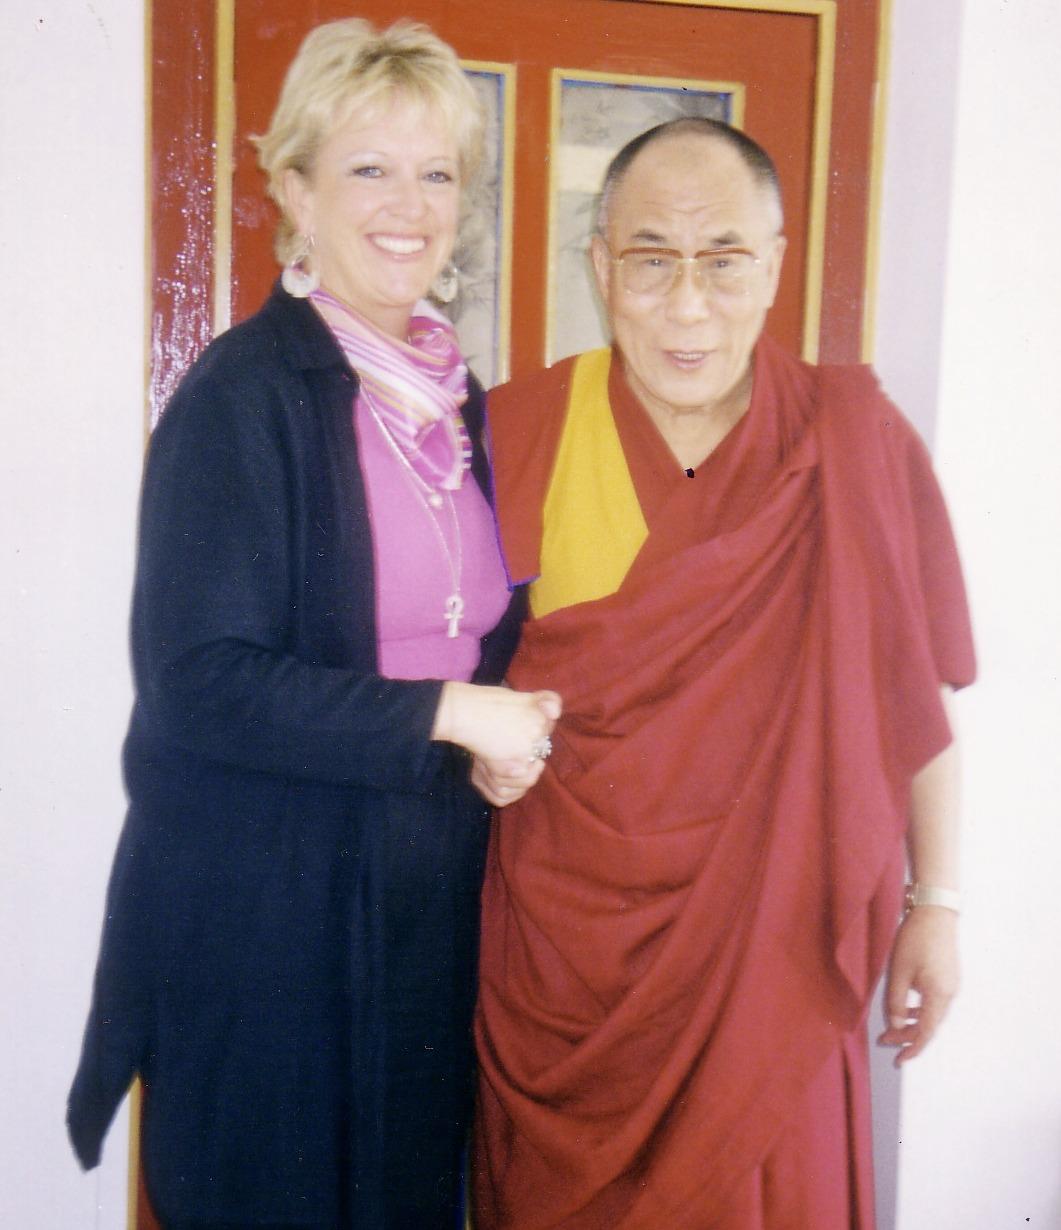 Dalai Lama - Linda Cruse